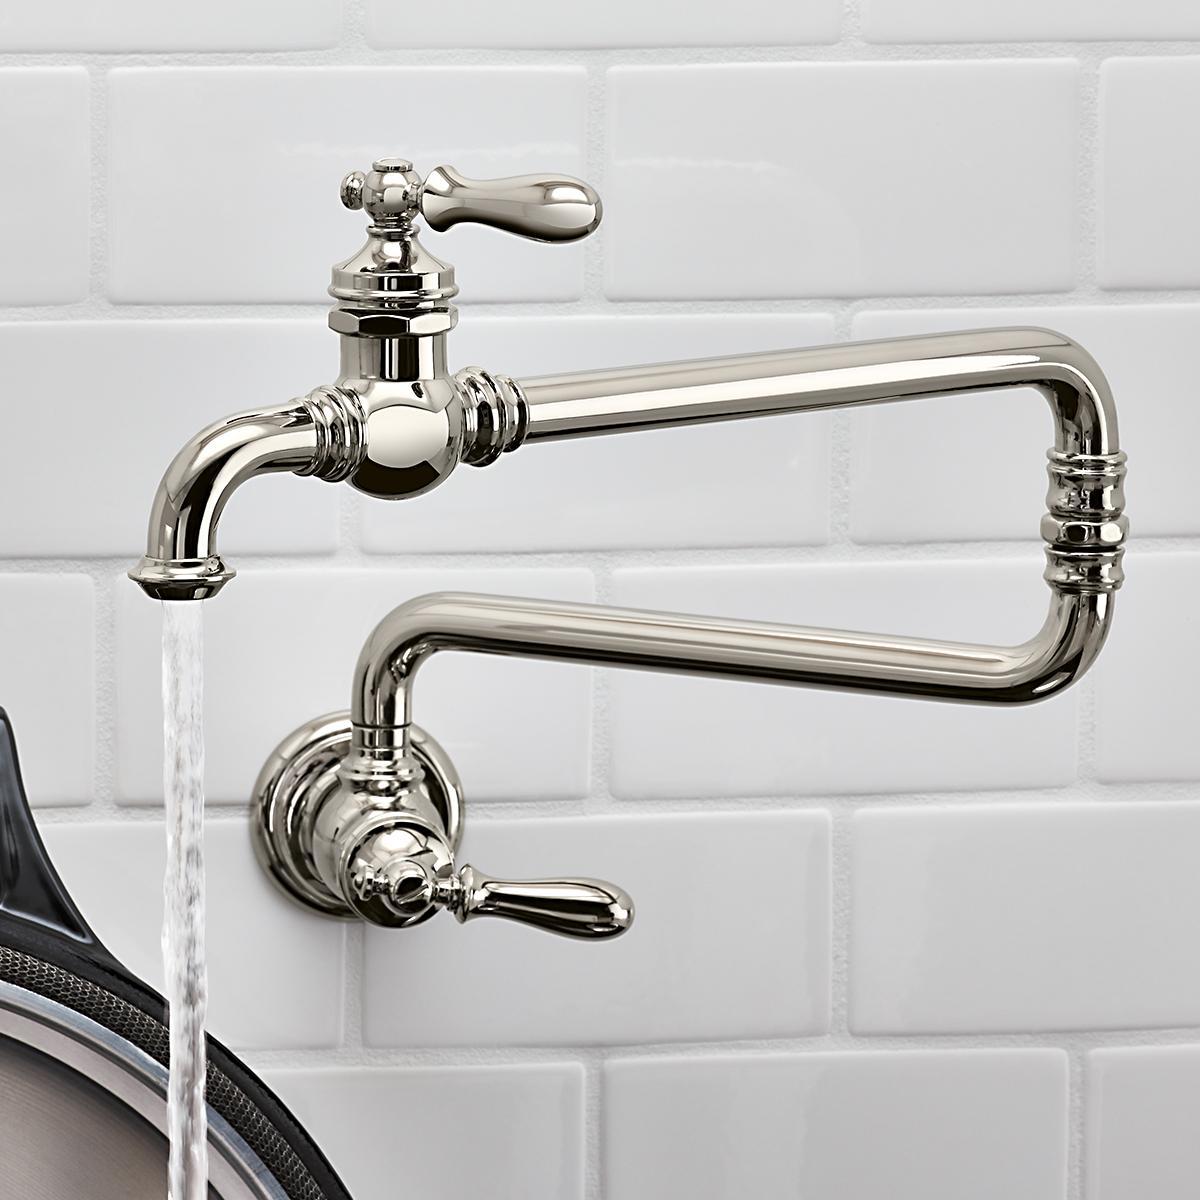 2018 Dual Holder Wall Mount Kitchen Faucet Kitchen Brass: KOHLER 99271-SN Artifacts Single-Hole Deck-Mount Pot